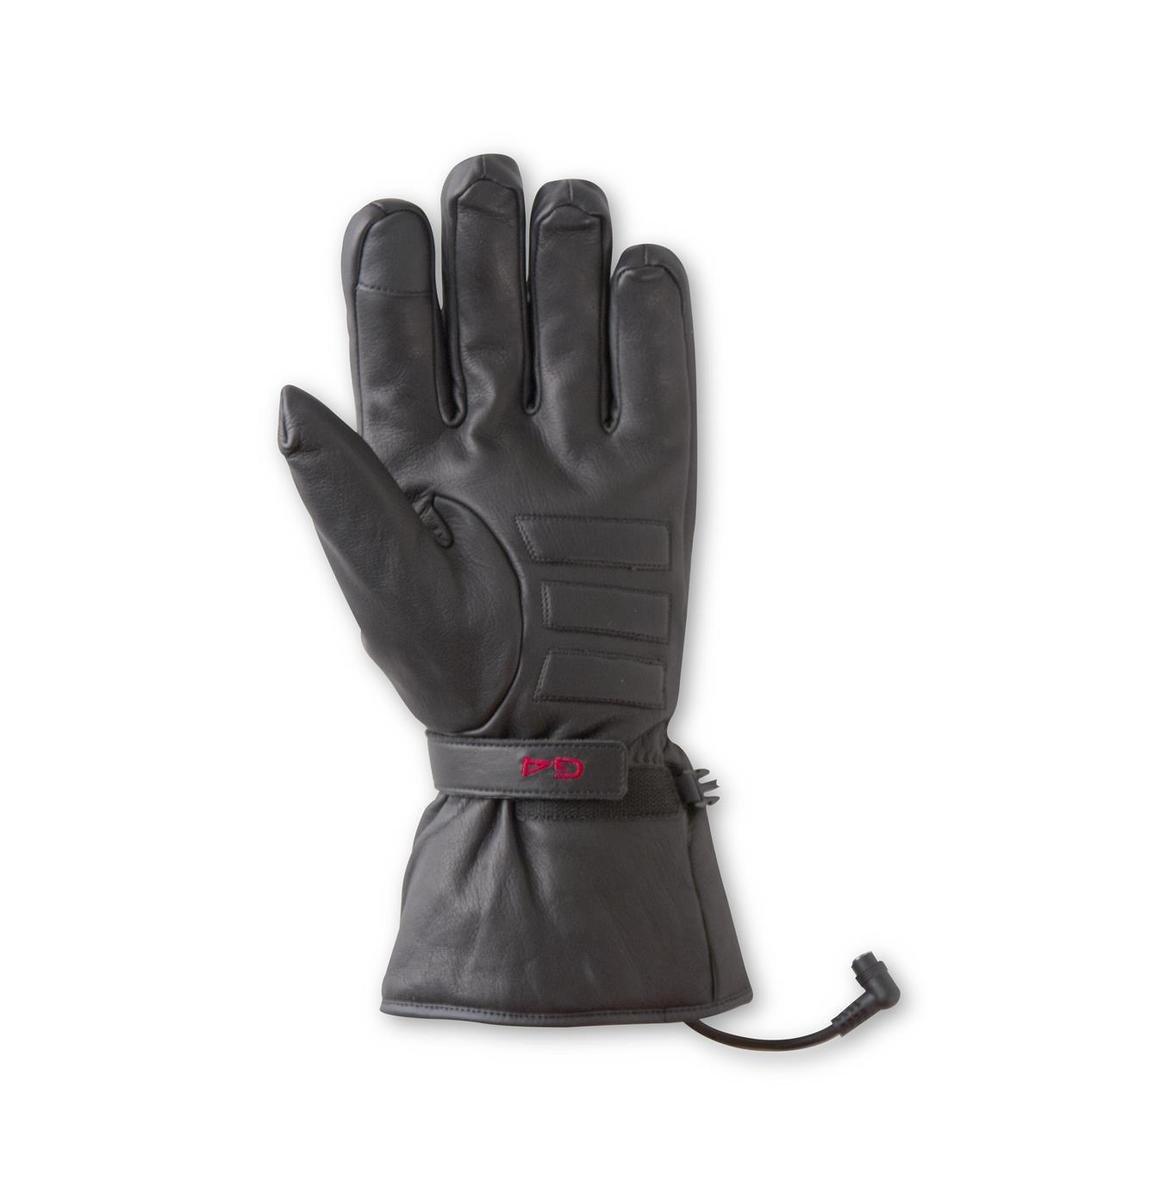 Men's Gyde G4 Adventure Travel Glove - Black - US SIZE S by Gyde (Image #2)